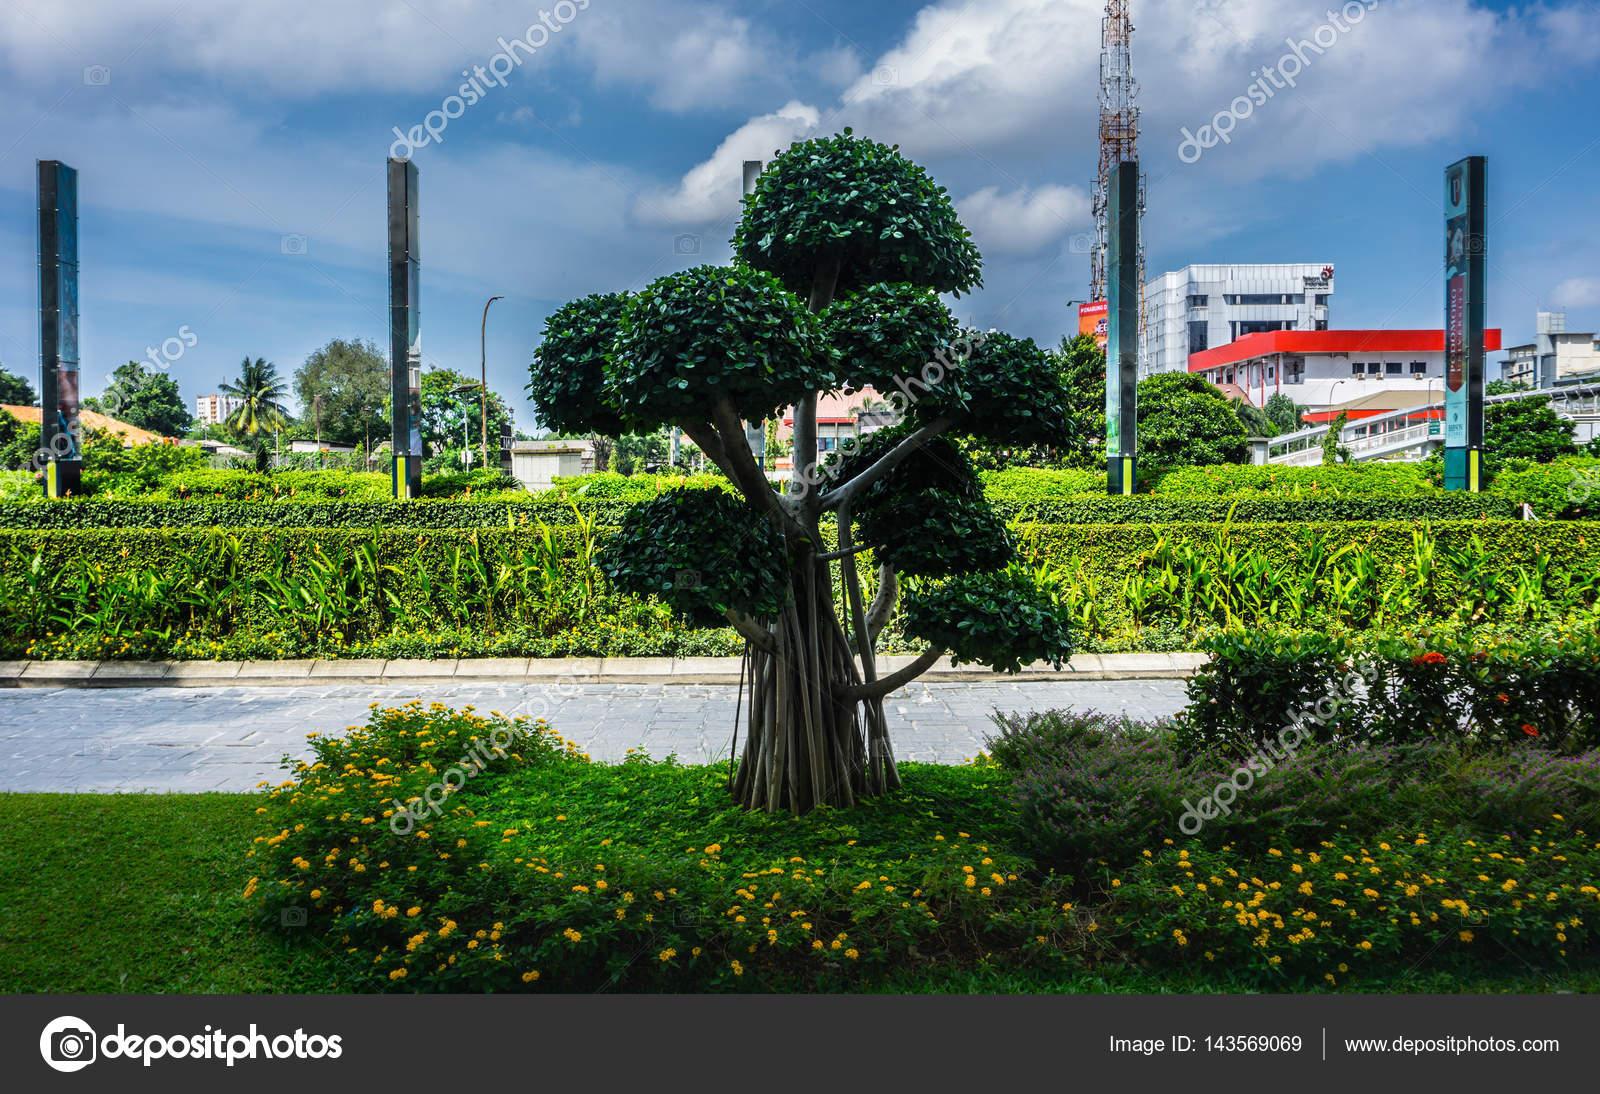 Park Als Tuin : Bonsai boom in een tuin in central park mall met blauwe bewolkte